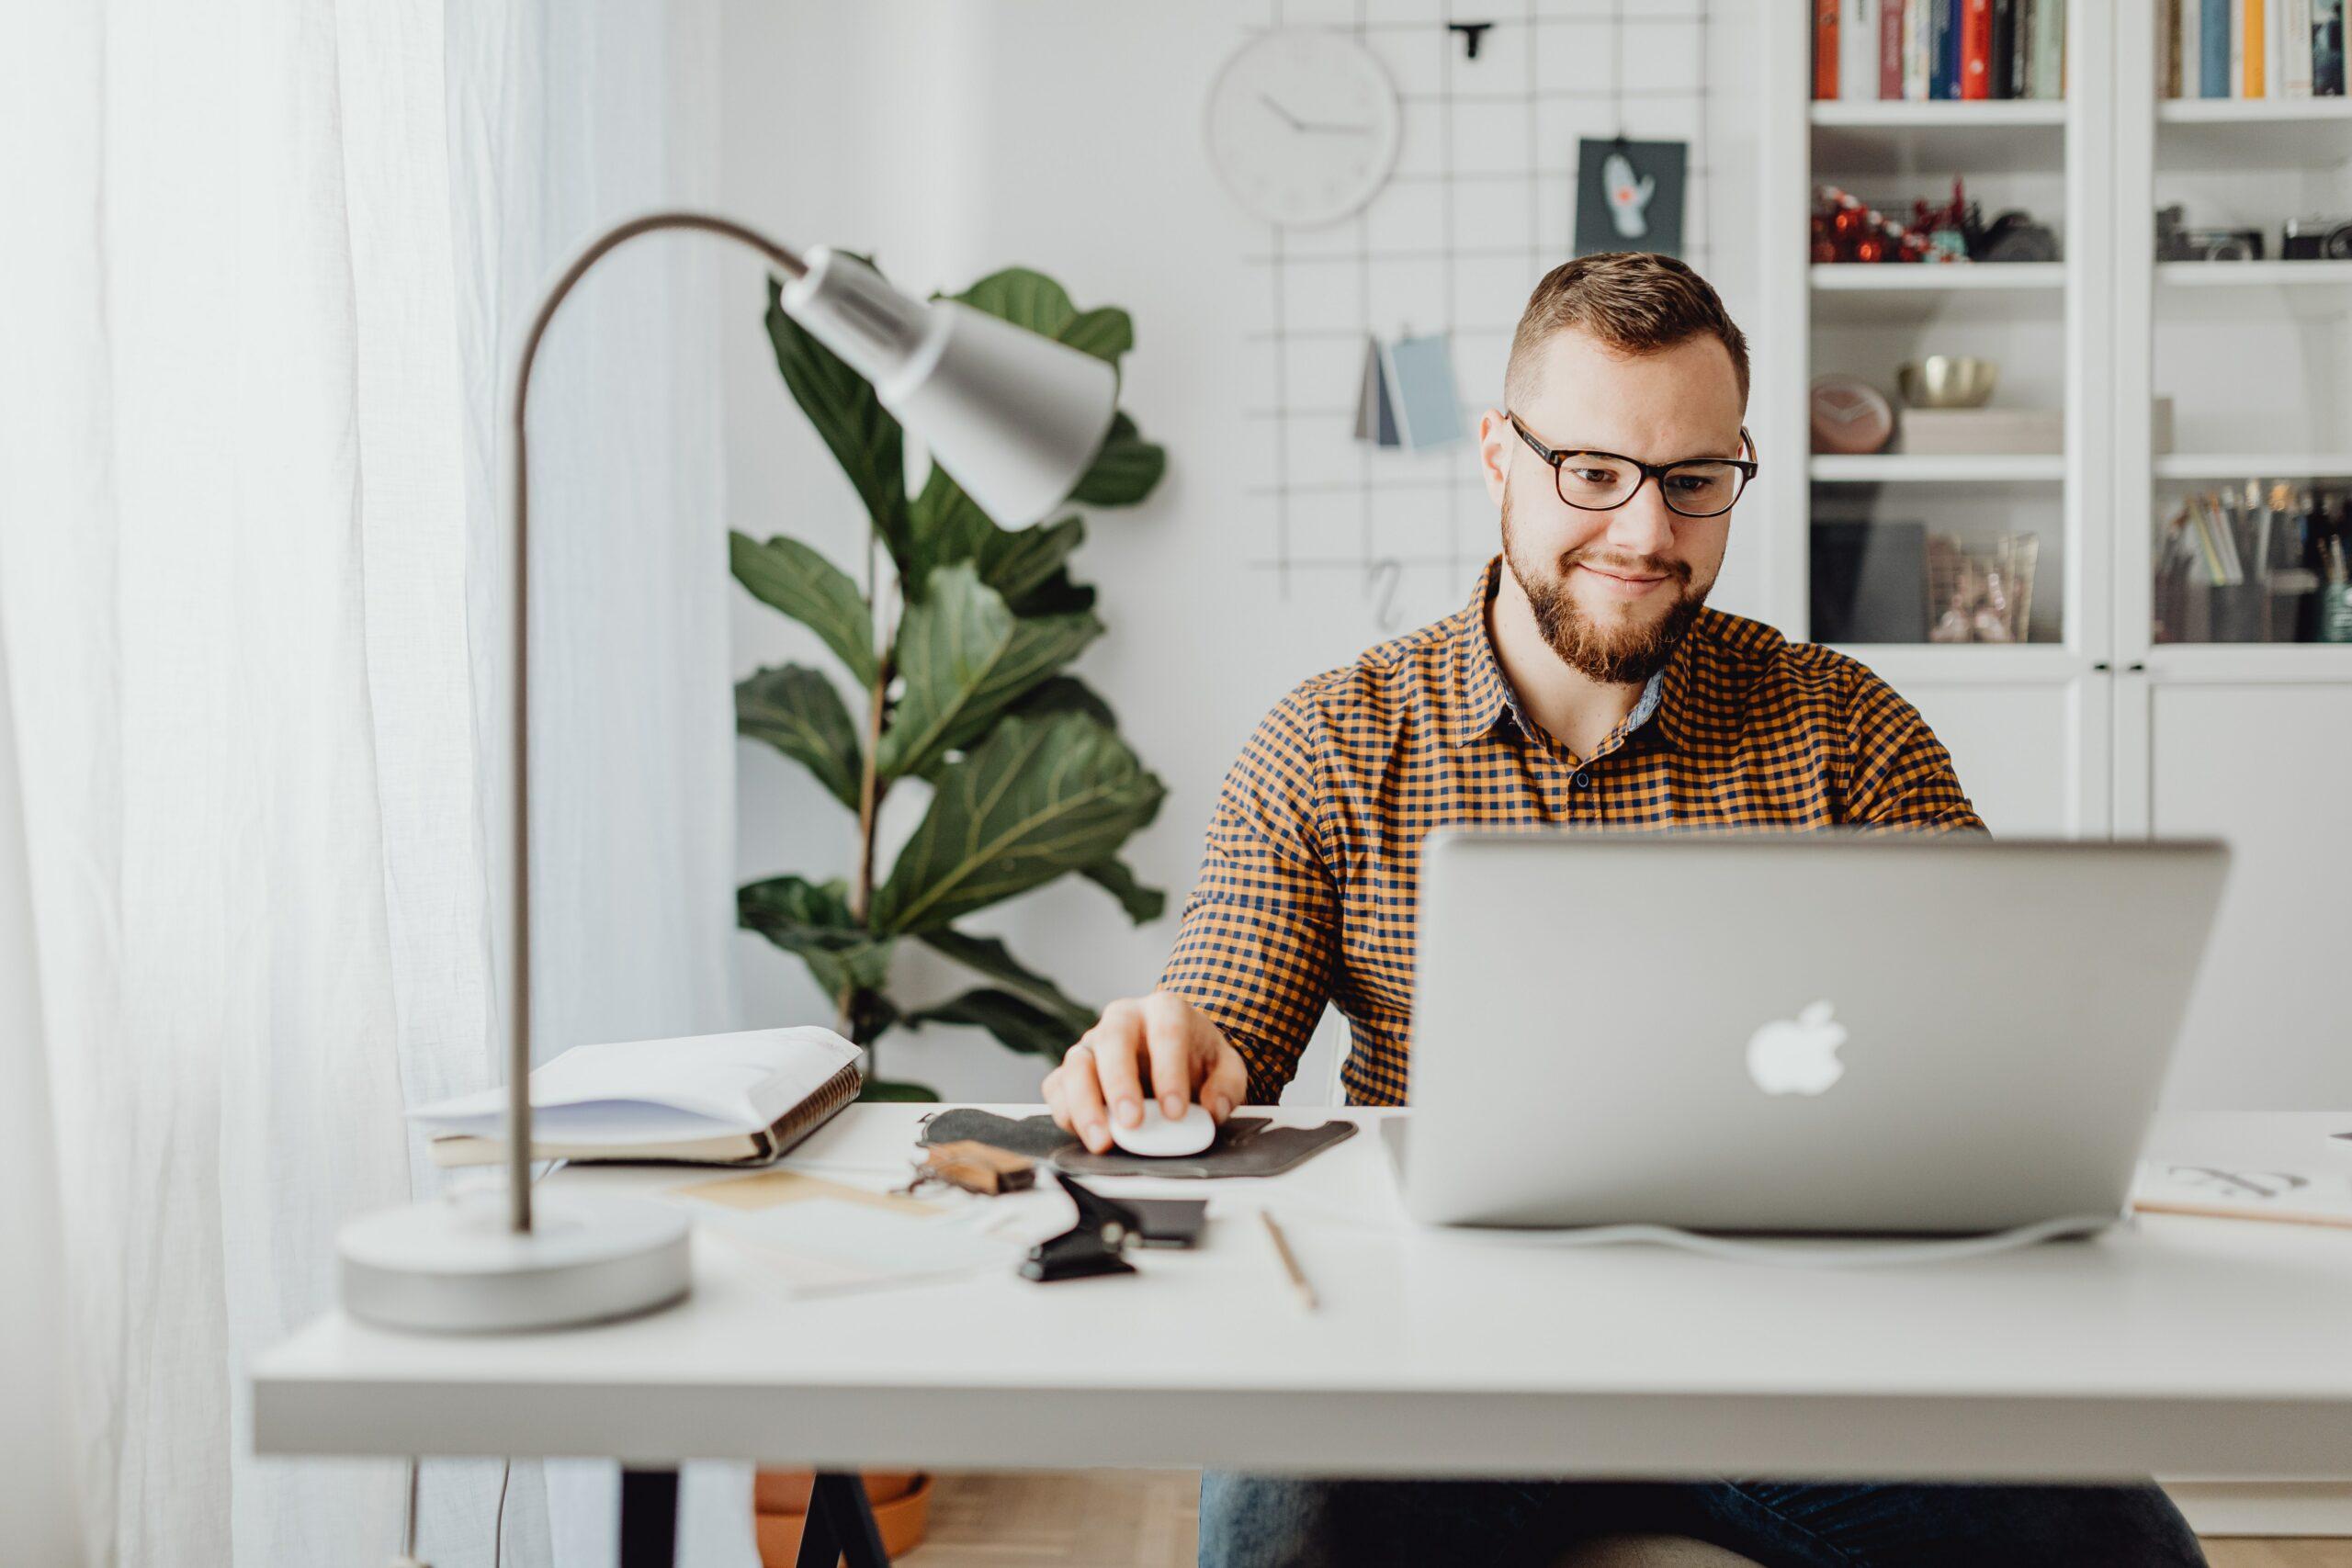 Instaurer un management bienveillant en télétravail